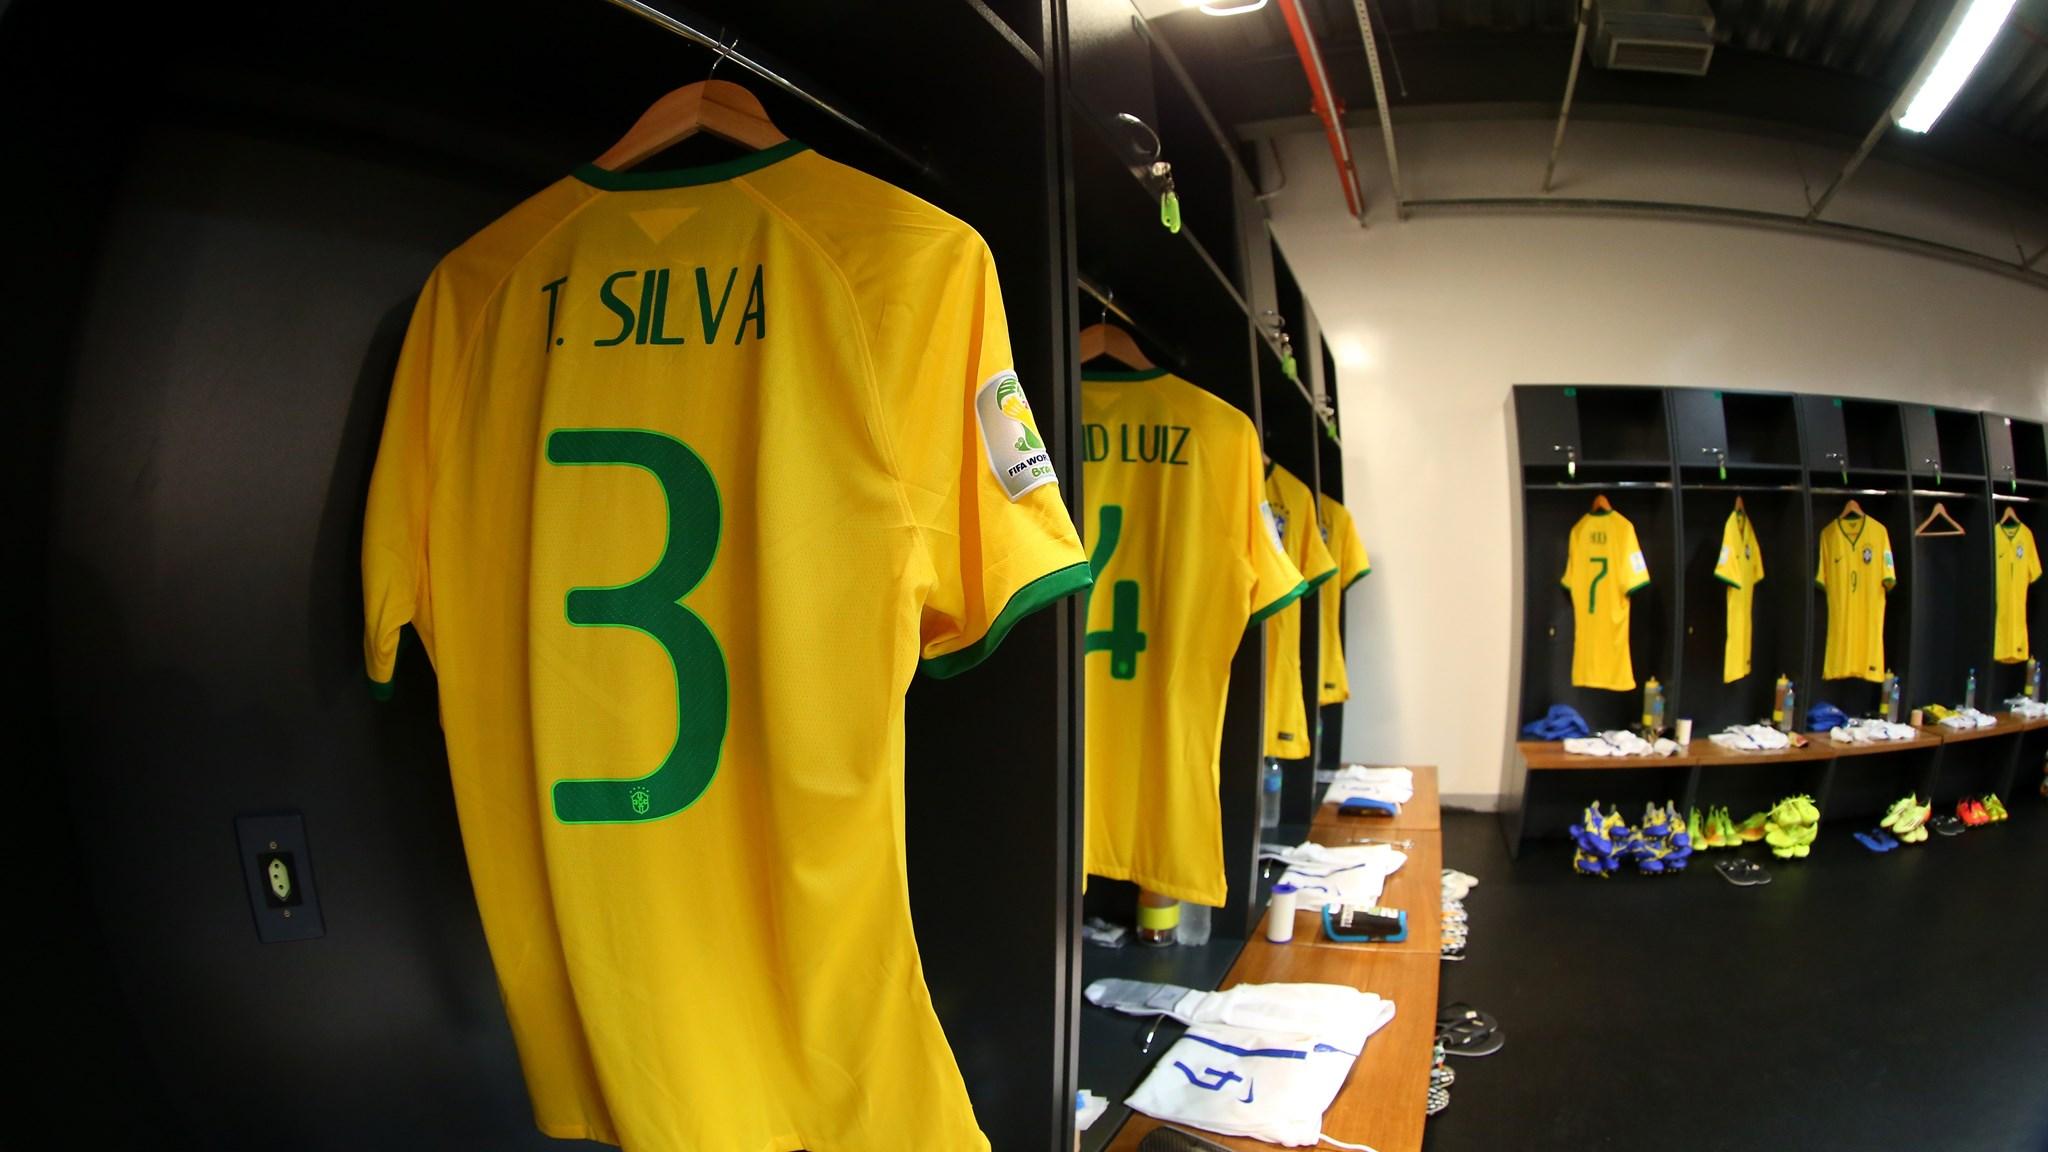 205 - Brazil-Netherlands [0-3] -- 12 Jul 2014 - 17-00 - kuaza